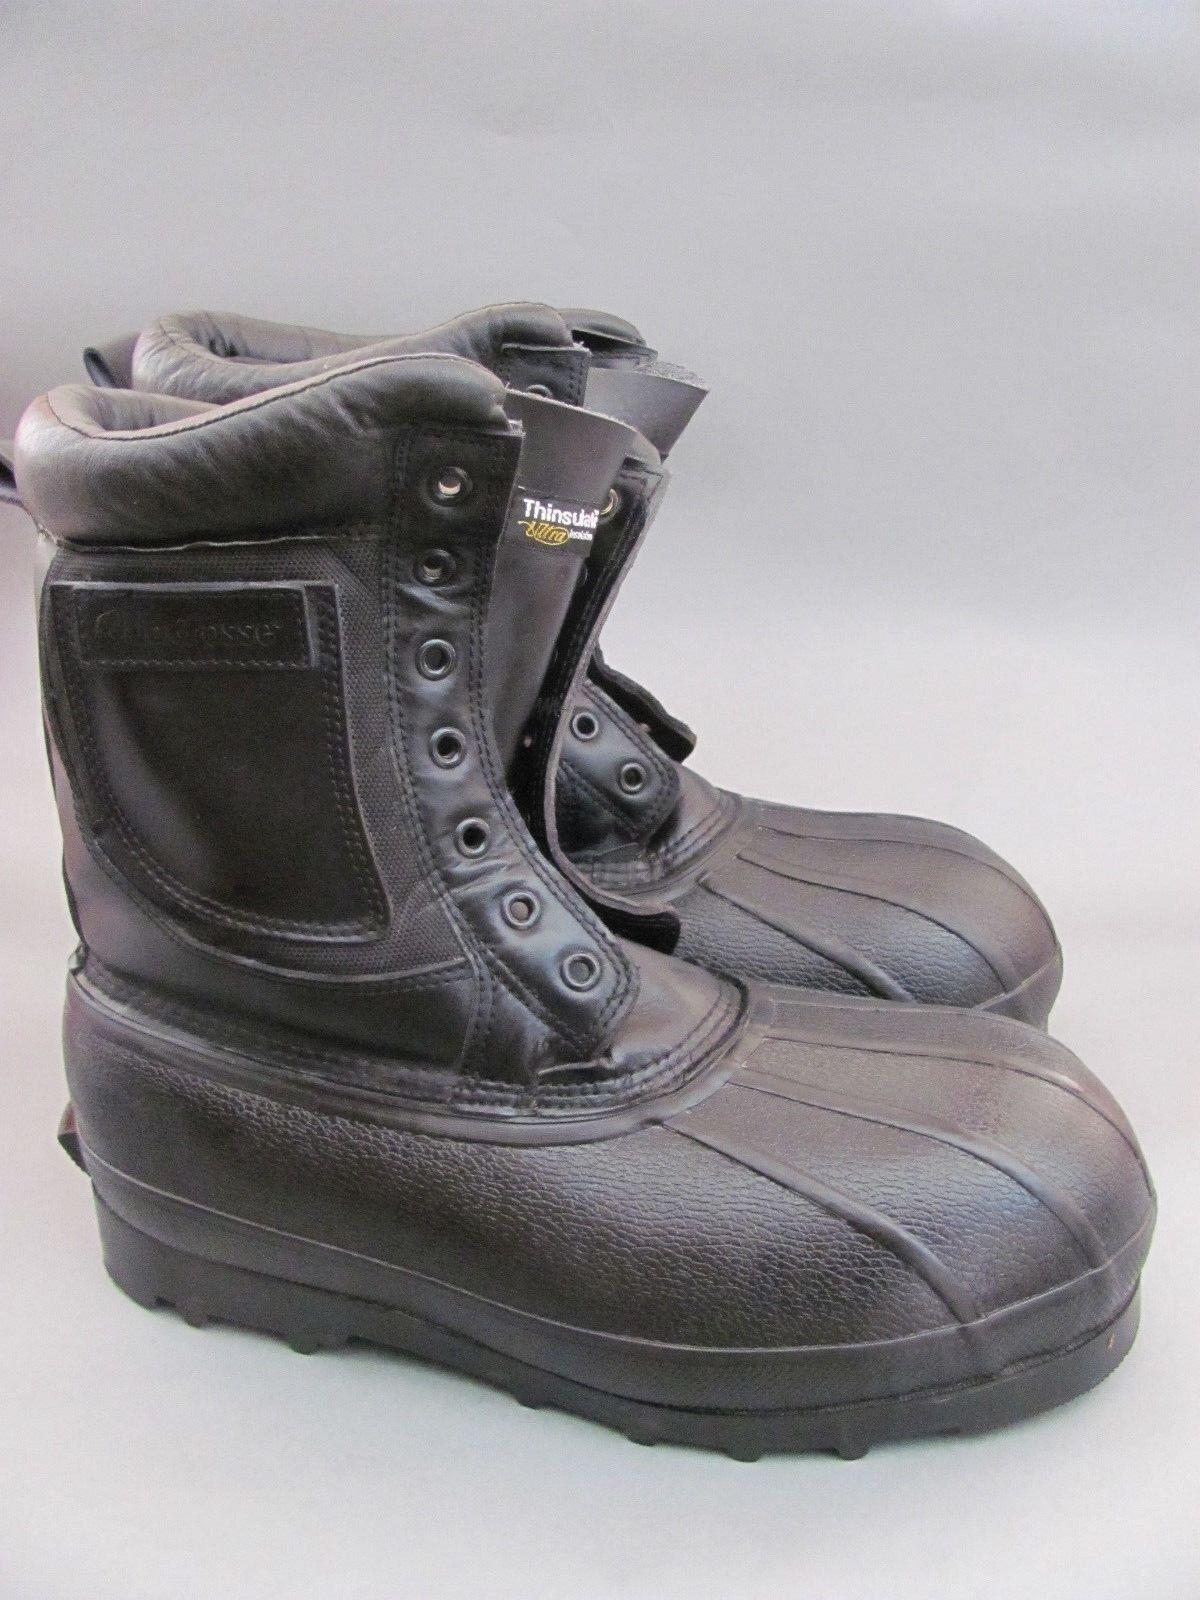 LaCrosse Iceberg Thinsulate Lined Non-Metallic Toe Boot, Men's 9